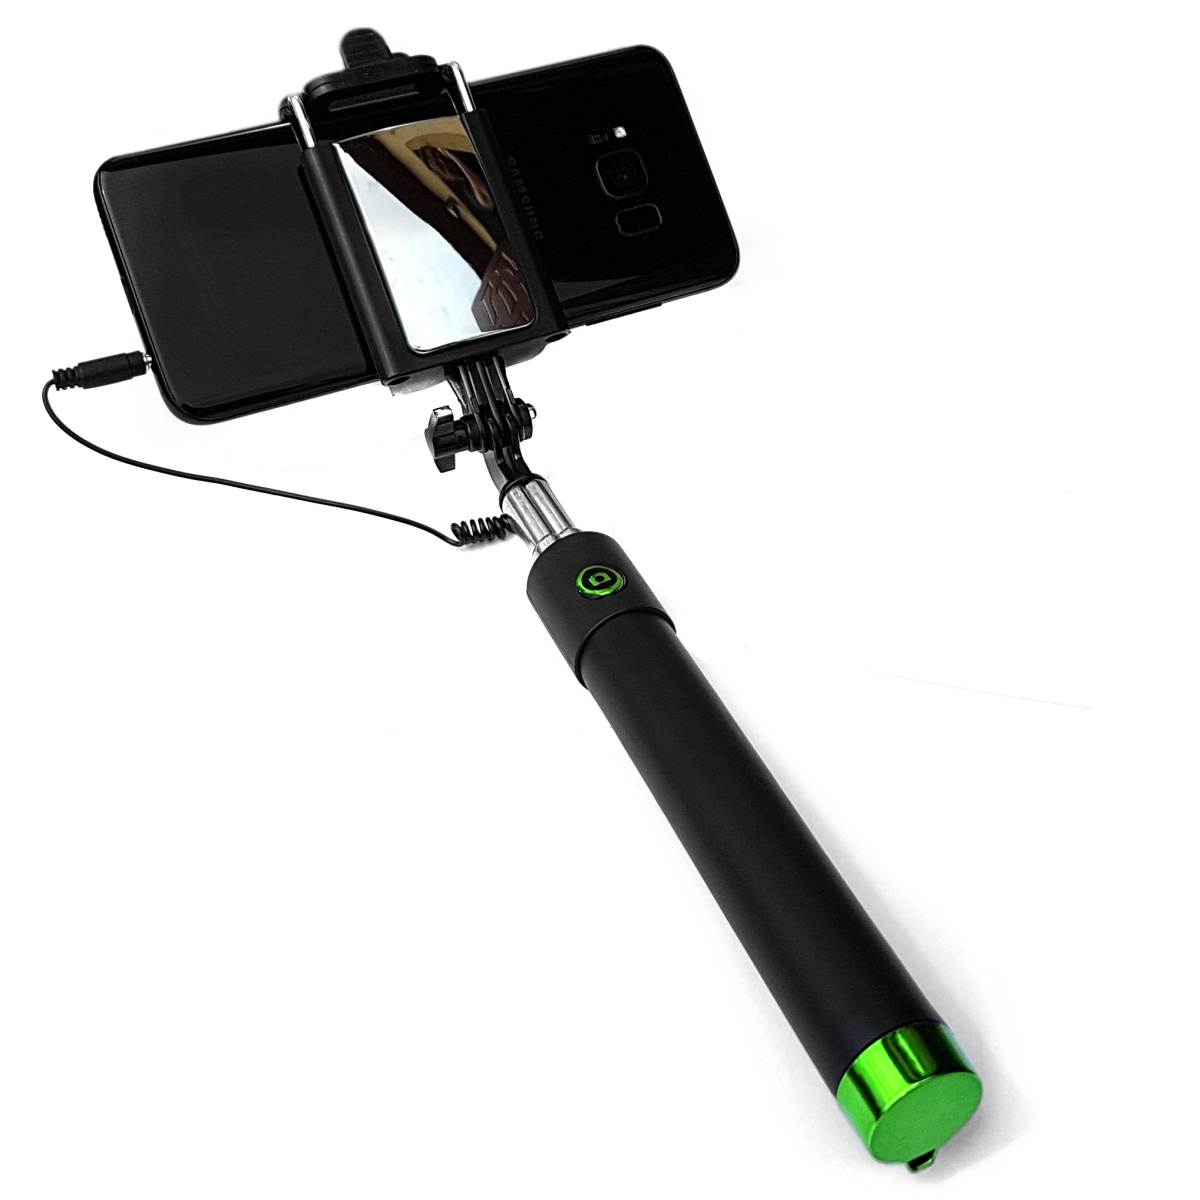 Kijek Selfiestick Monopod Huawei ShotX Dual SIM